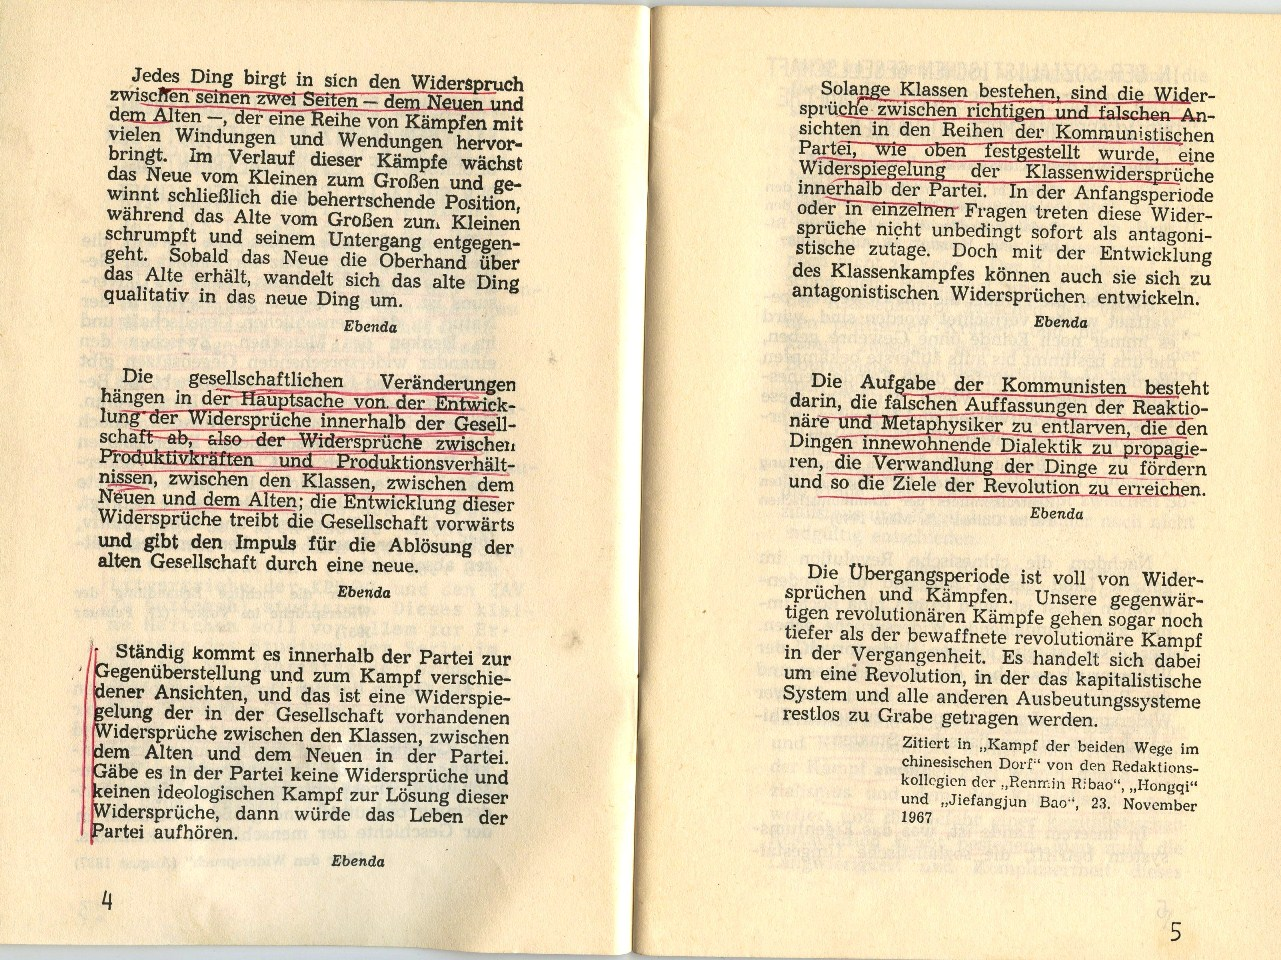 ZB_Mao_Revolutionstheorie_1971_04